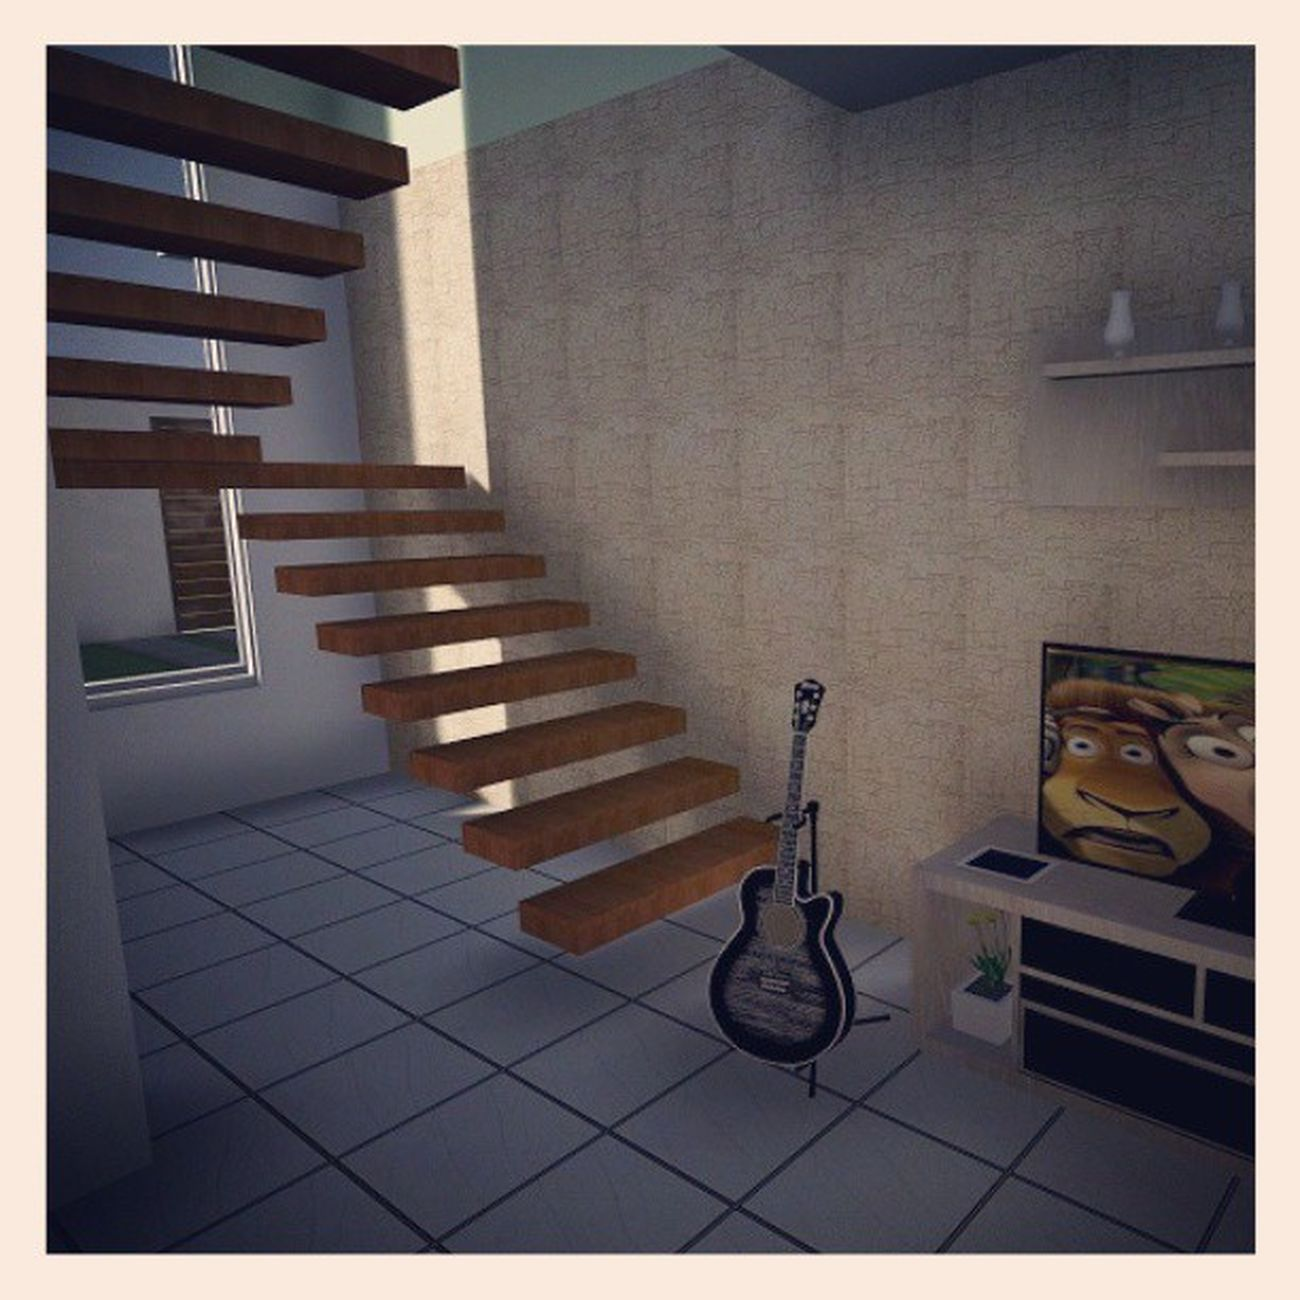 MaqueteVirtual Lumion3D SketchUp ArquiteturaNaVeia instalove amoMtoTudoIsso